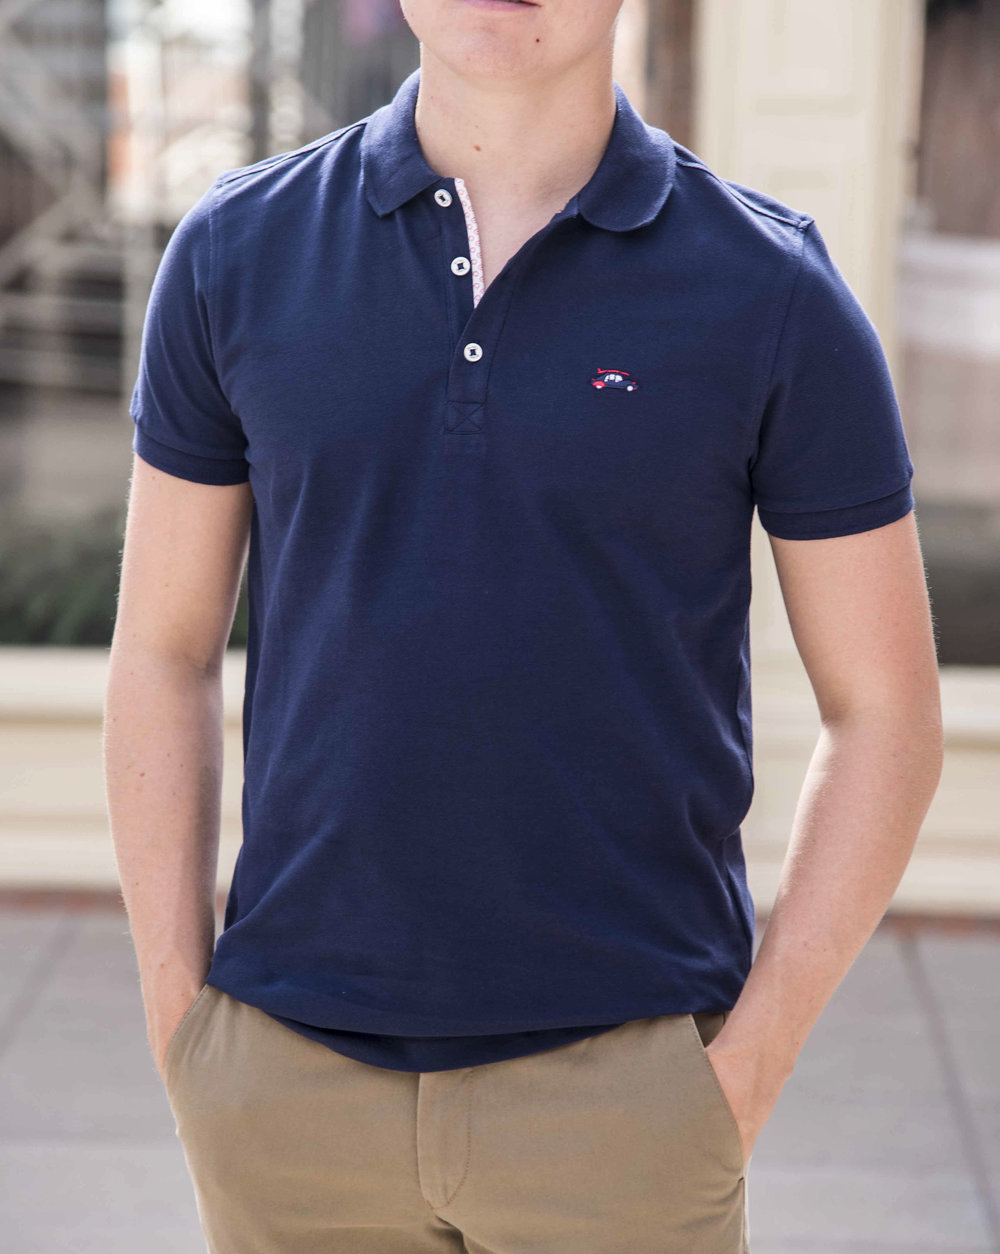 Men's dark blue polo cropped.jpg